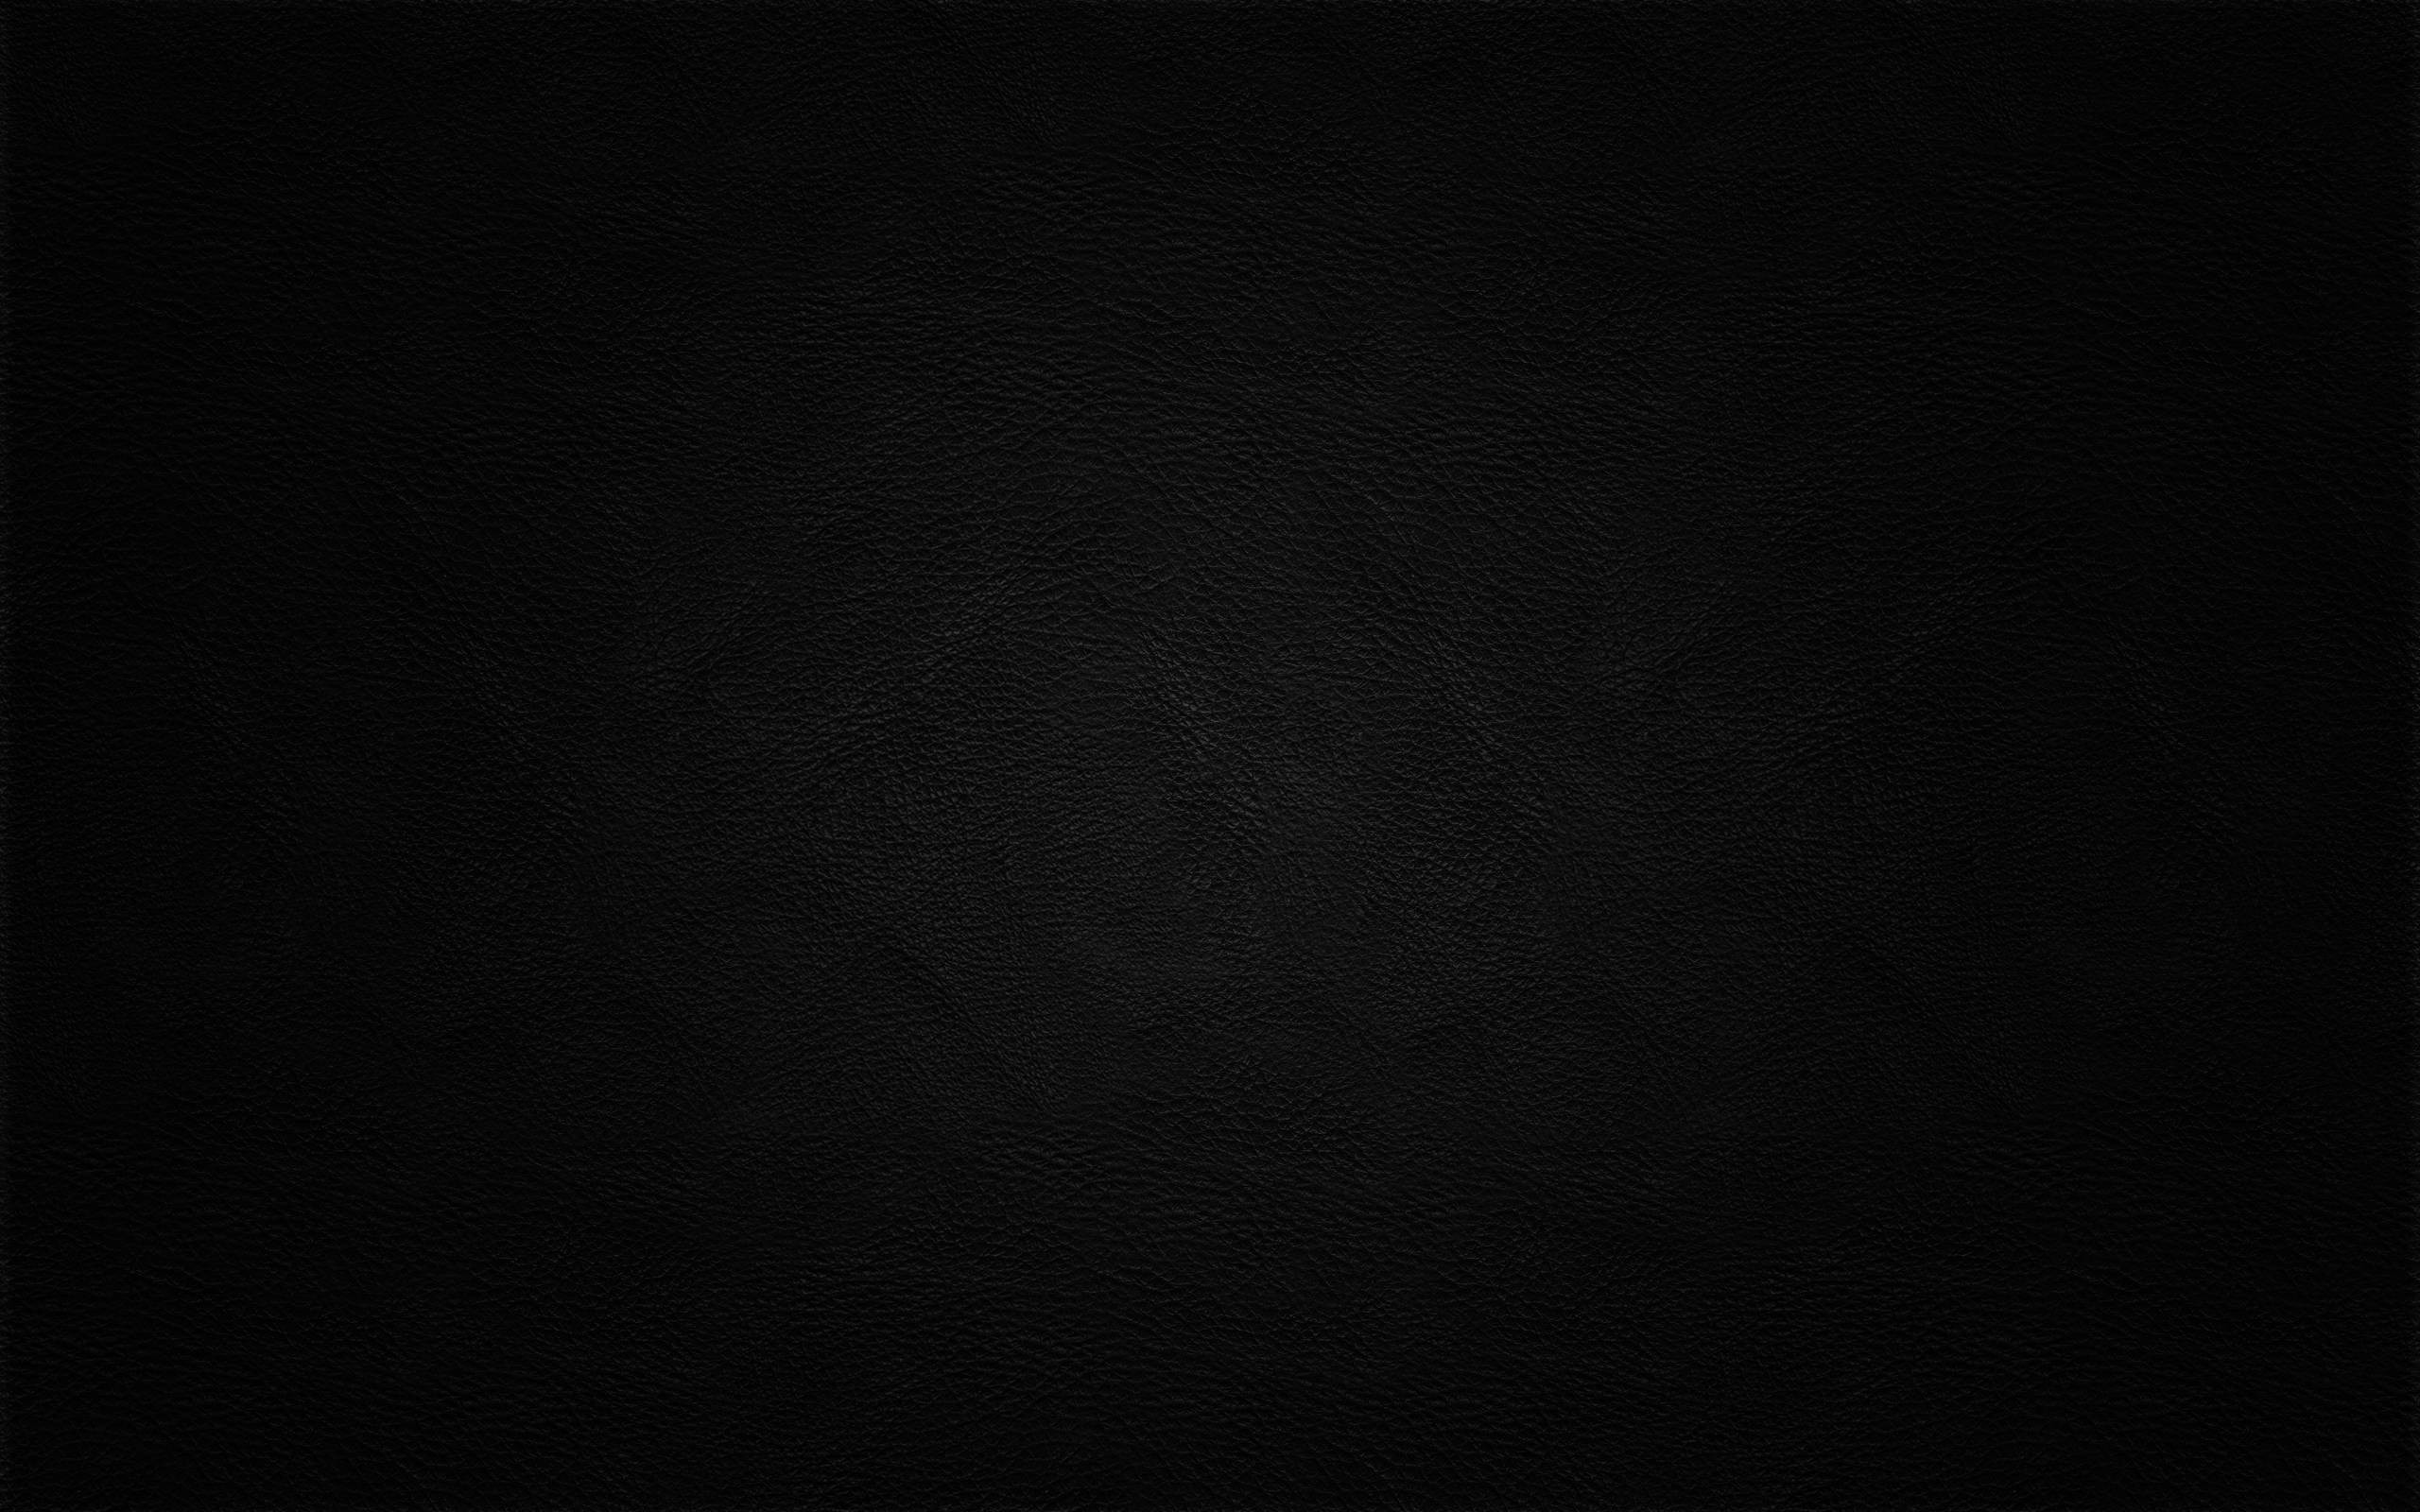 Black Wallpaper 1920x1080 Glossy Black Wallpaper 72 Images